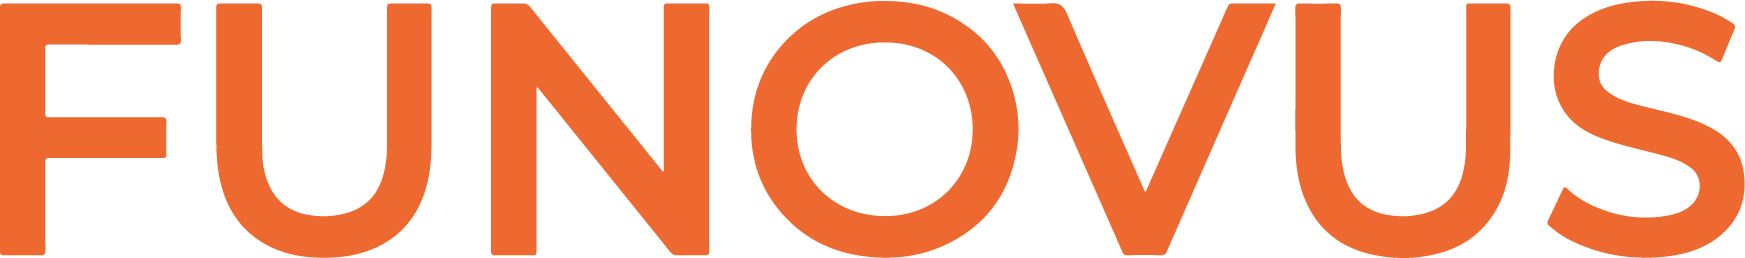 Funovus logo